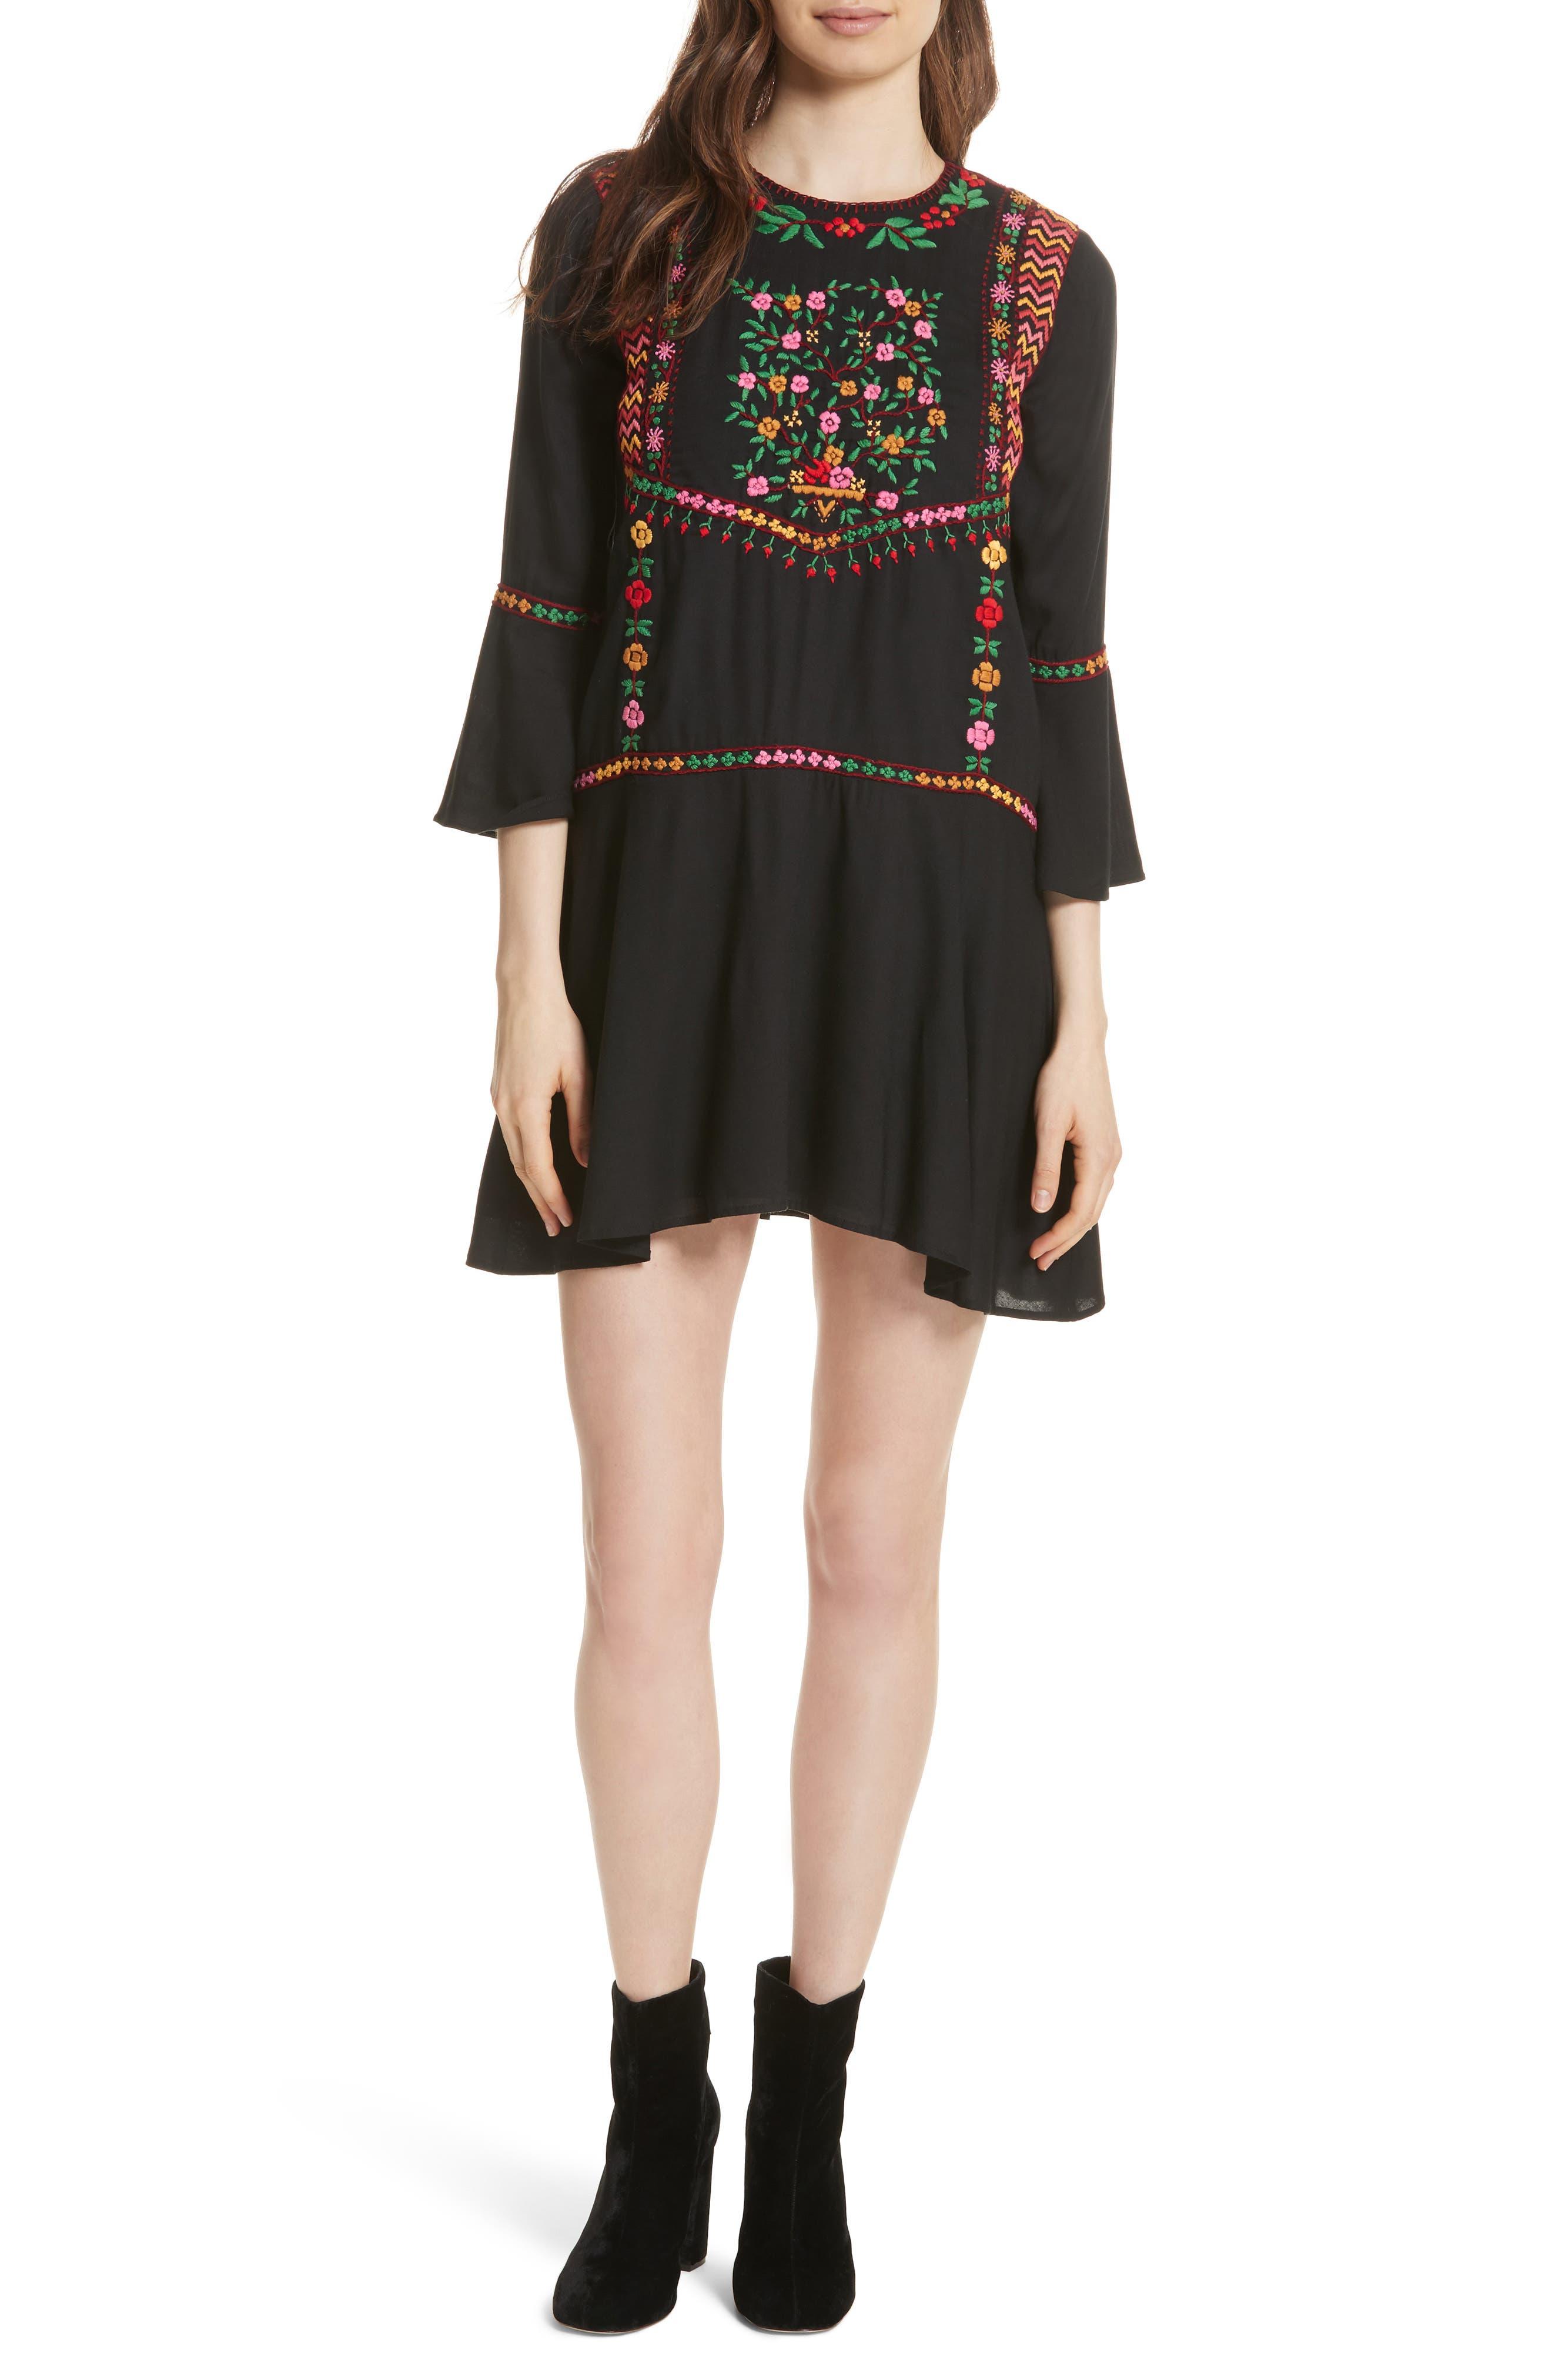 Gosinda Embroidered Dress,                             Main thumbnail 1, color,                             Caviar/ Multi